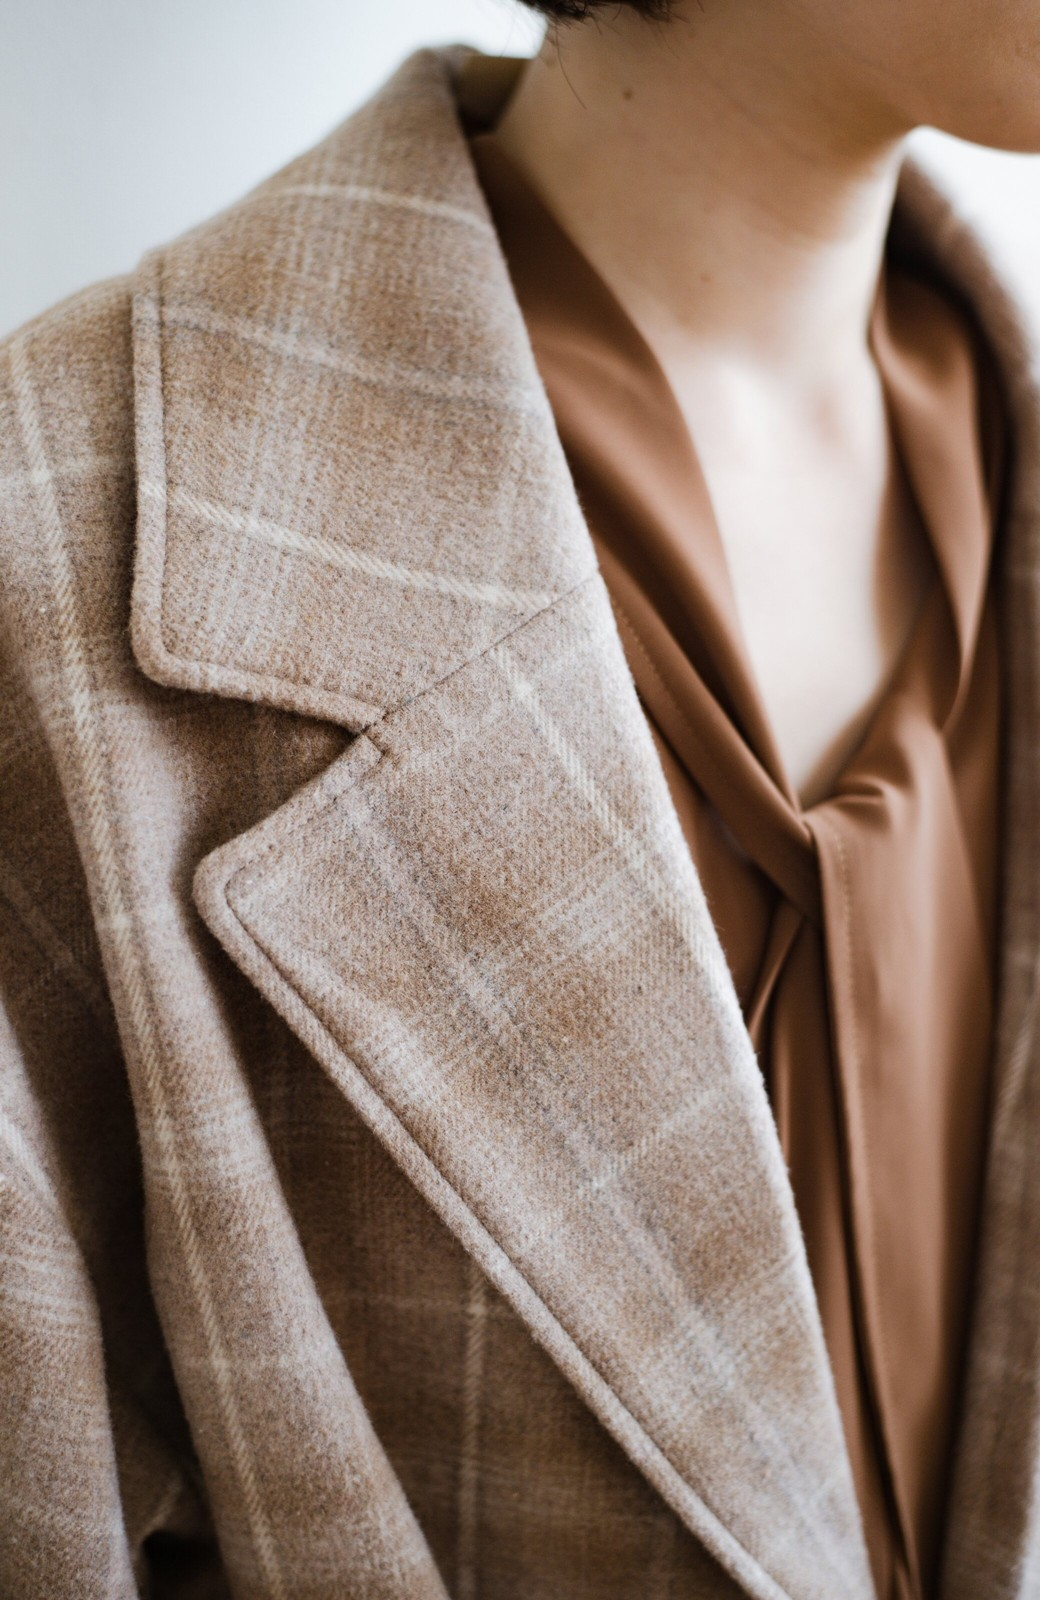 haco! パッと羽織るだけで様になる!カジュアルにも大人っぽくも着られる便利なチェックコート <ベージュ系その他>の商品写真6